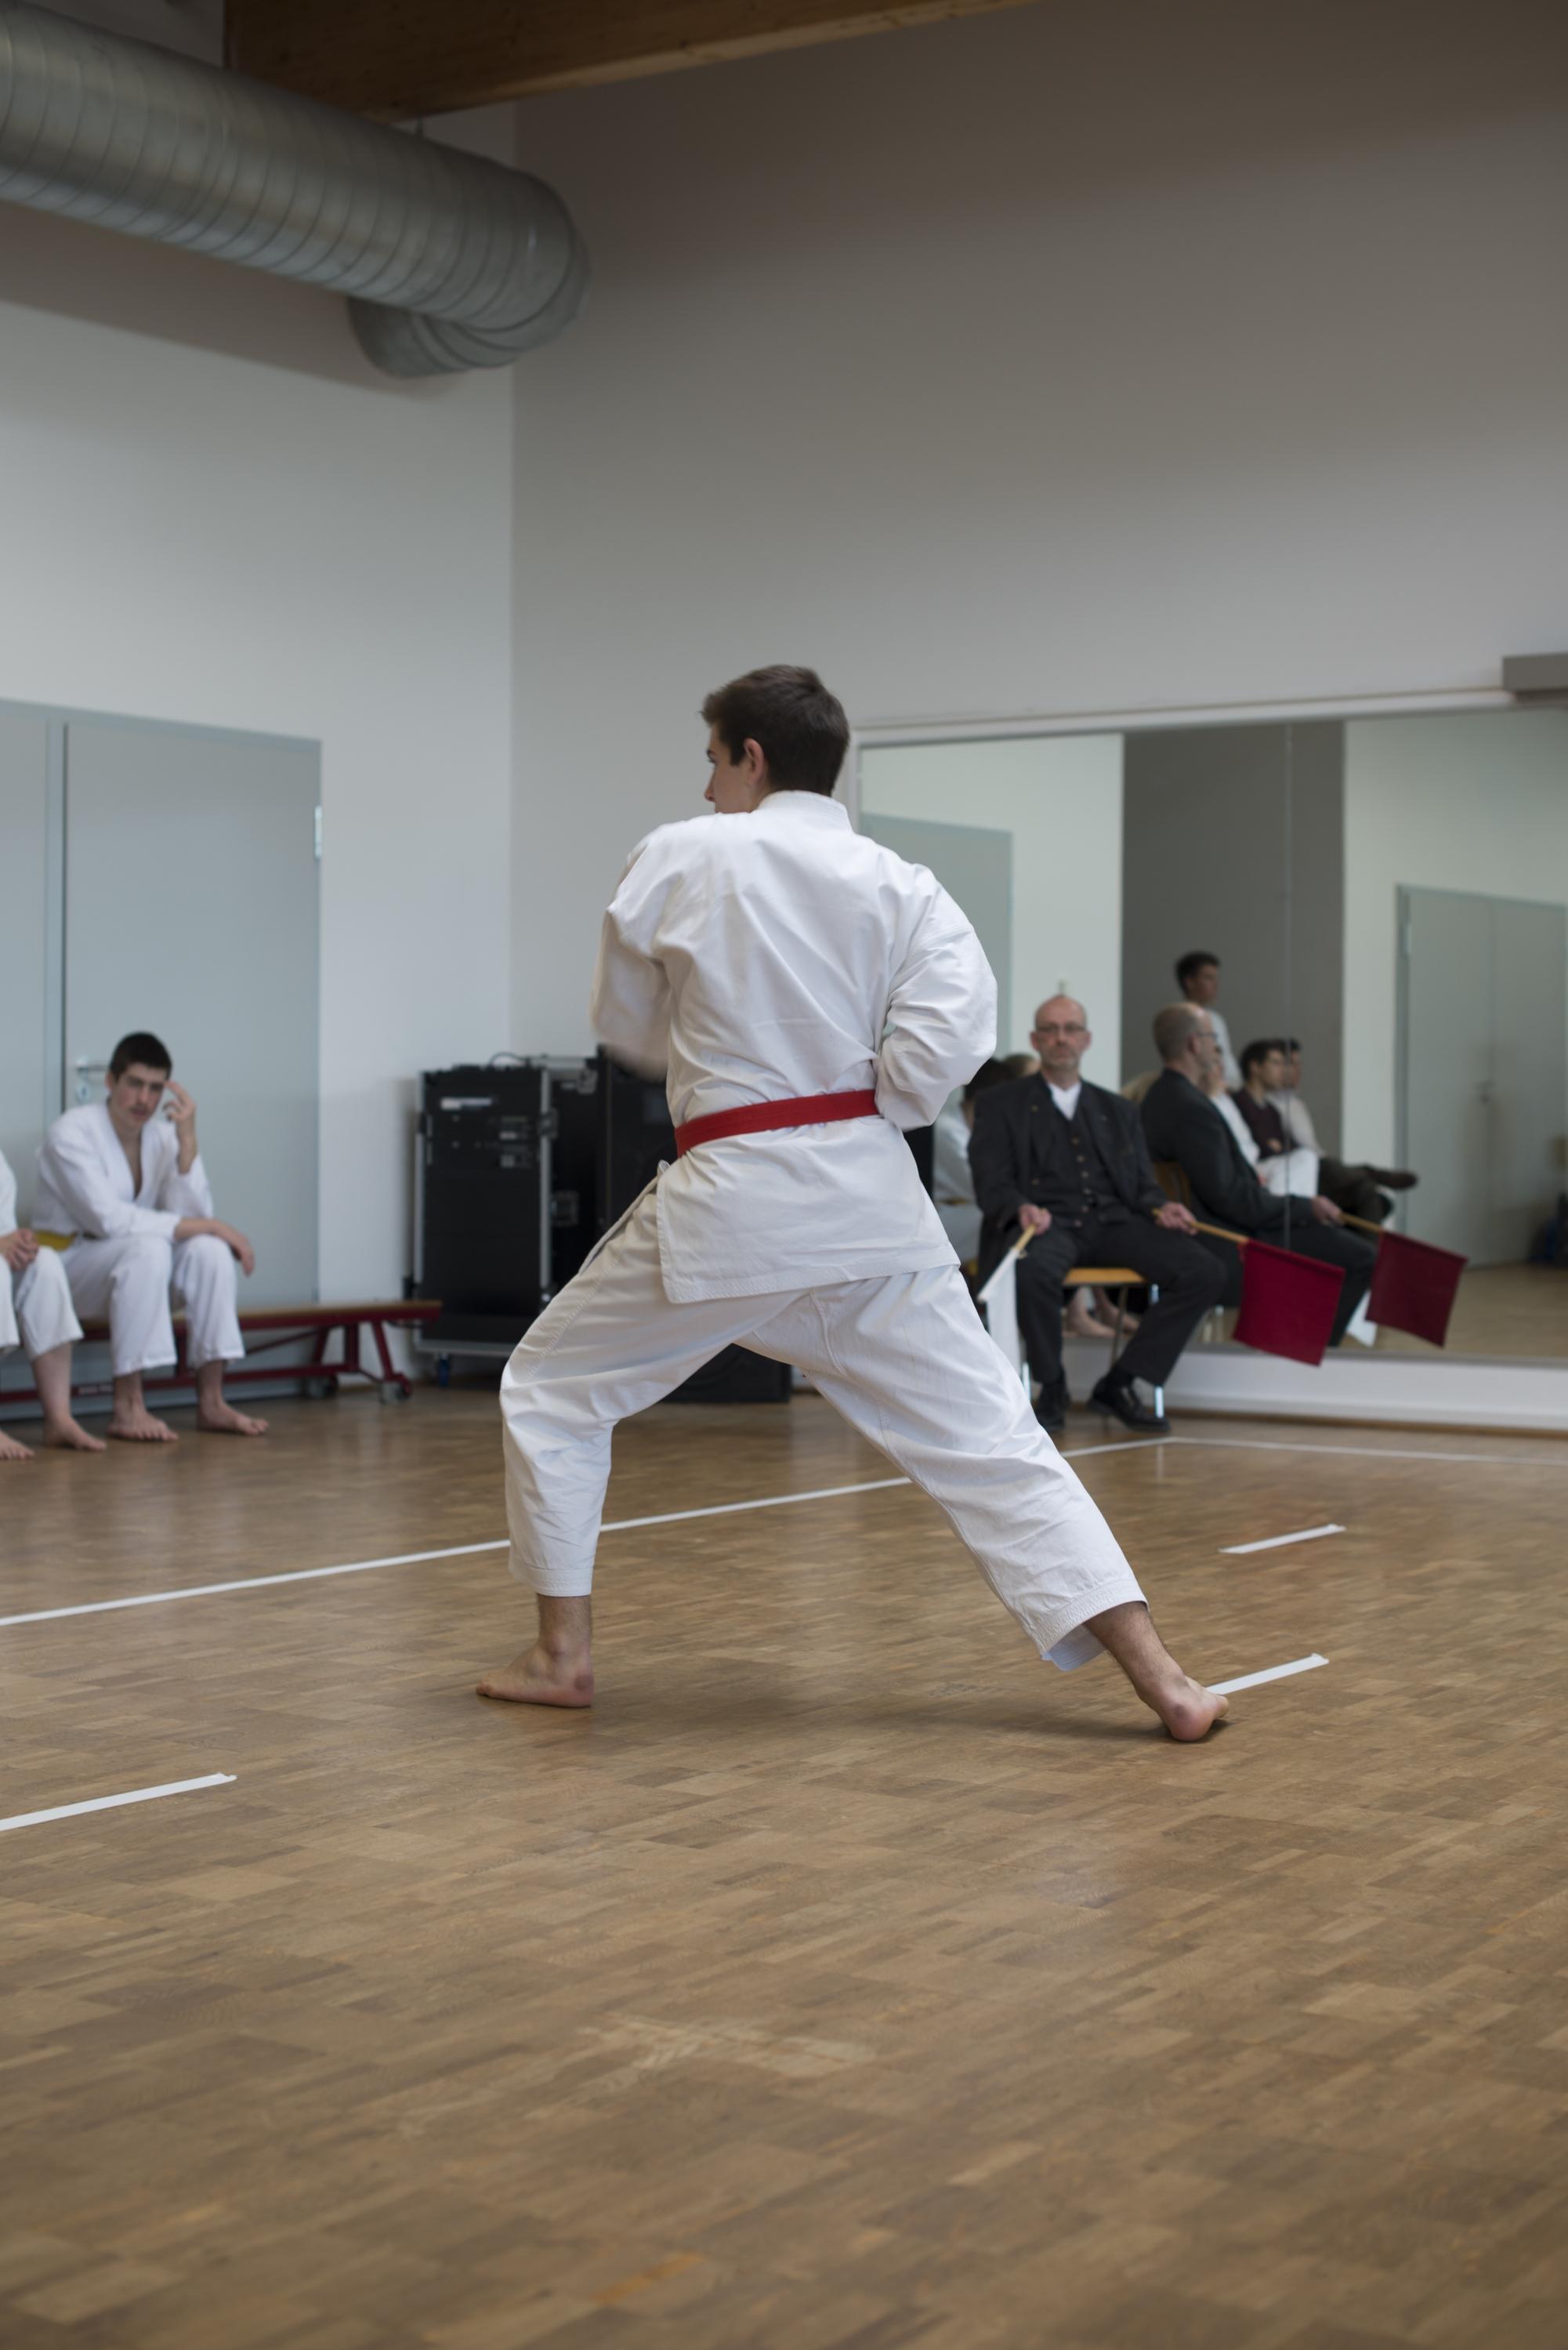 2016-04-26 Kata Turnier Kaarst 248